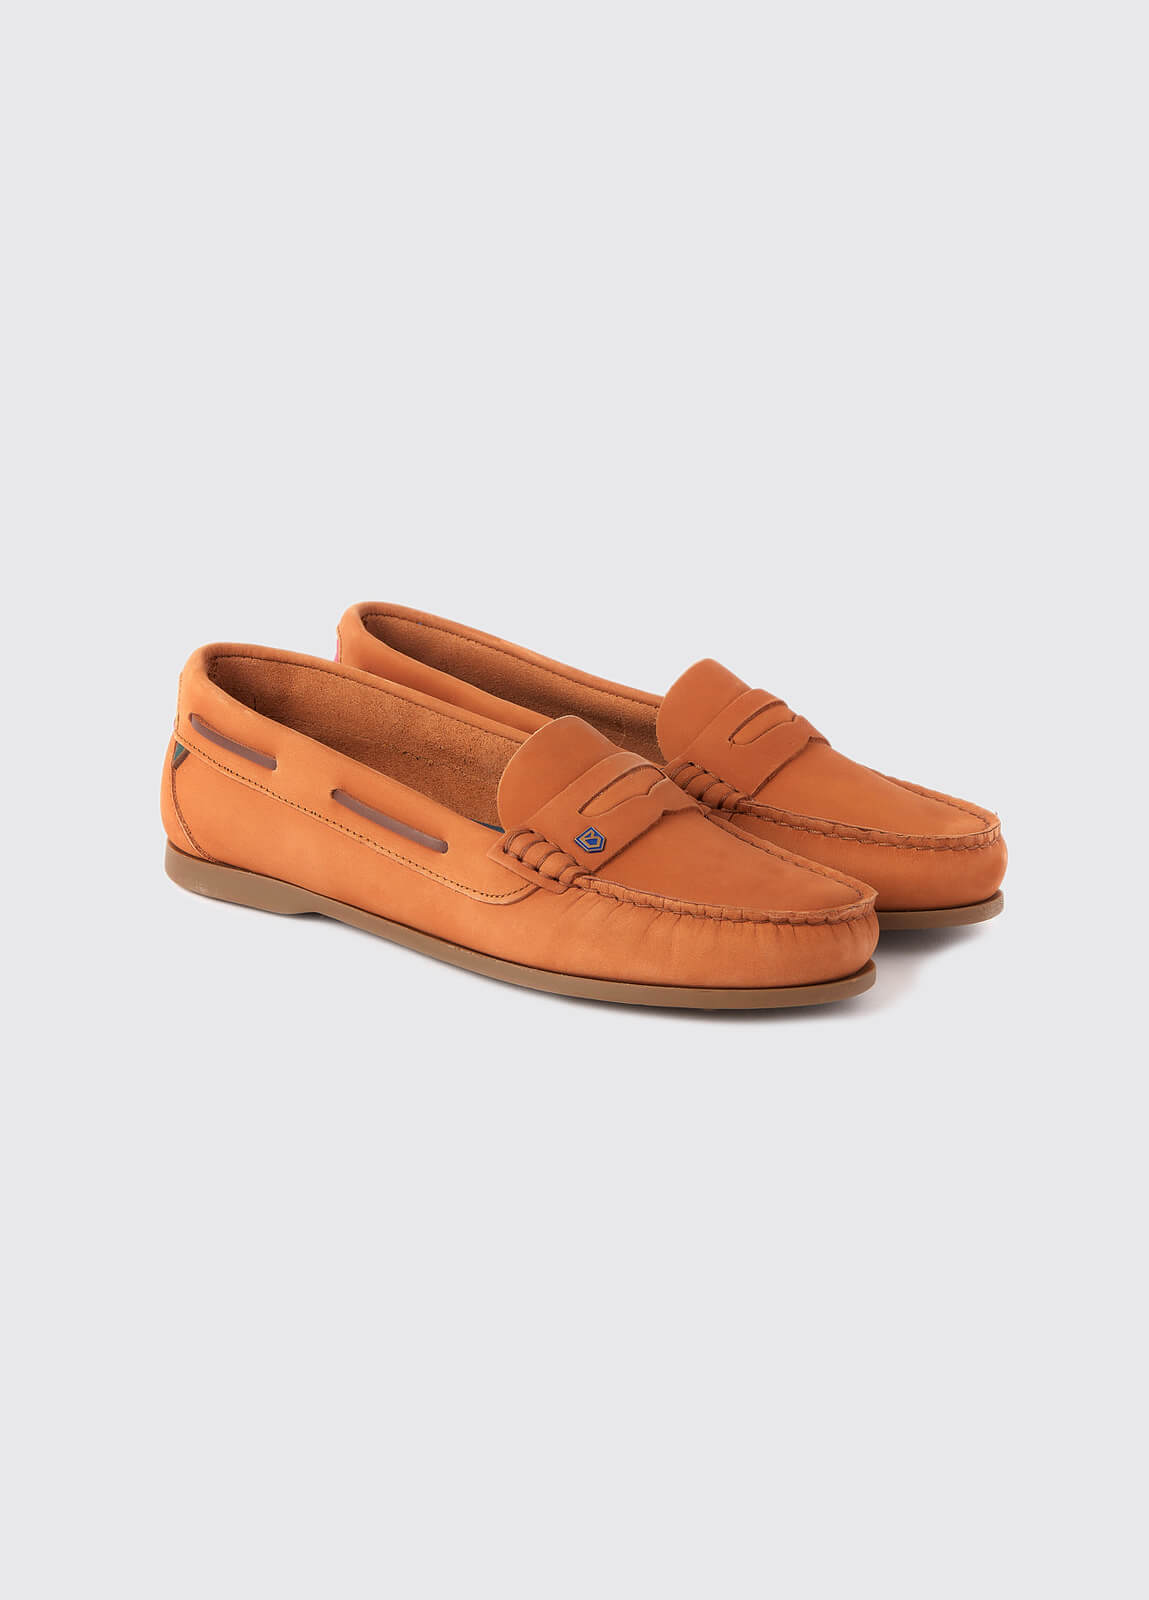 Belize Deck Shoe - Caramel